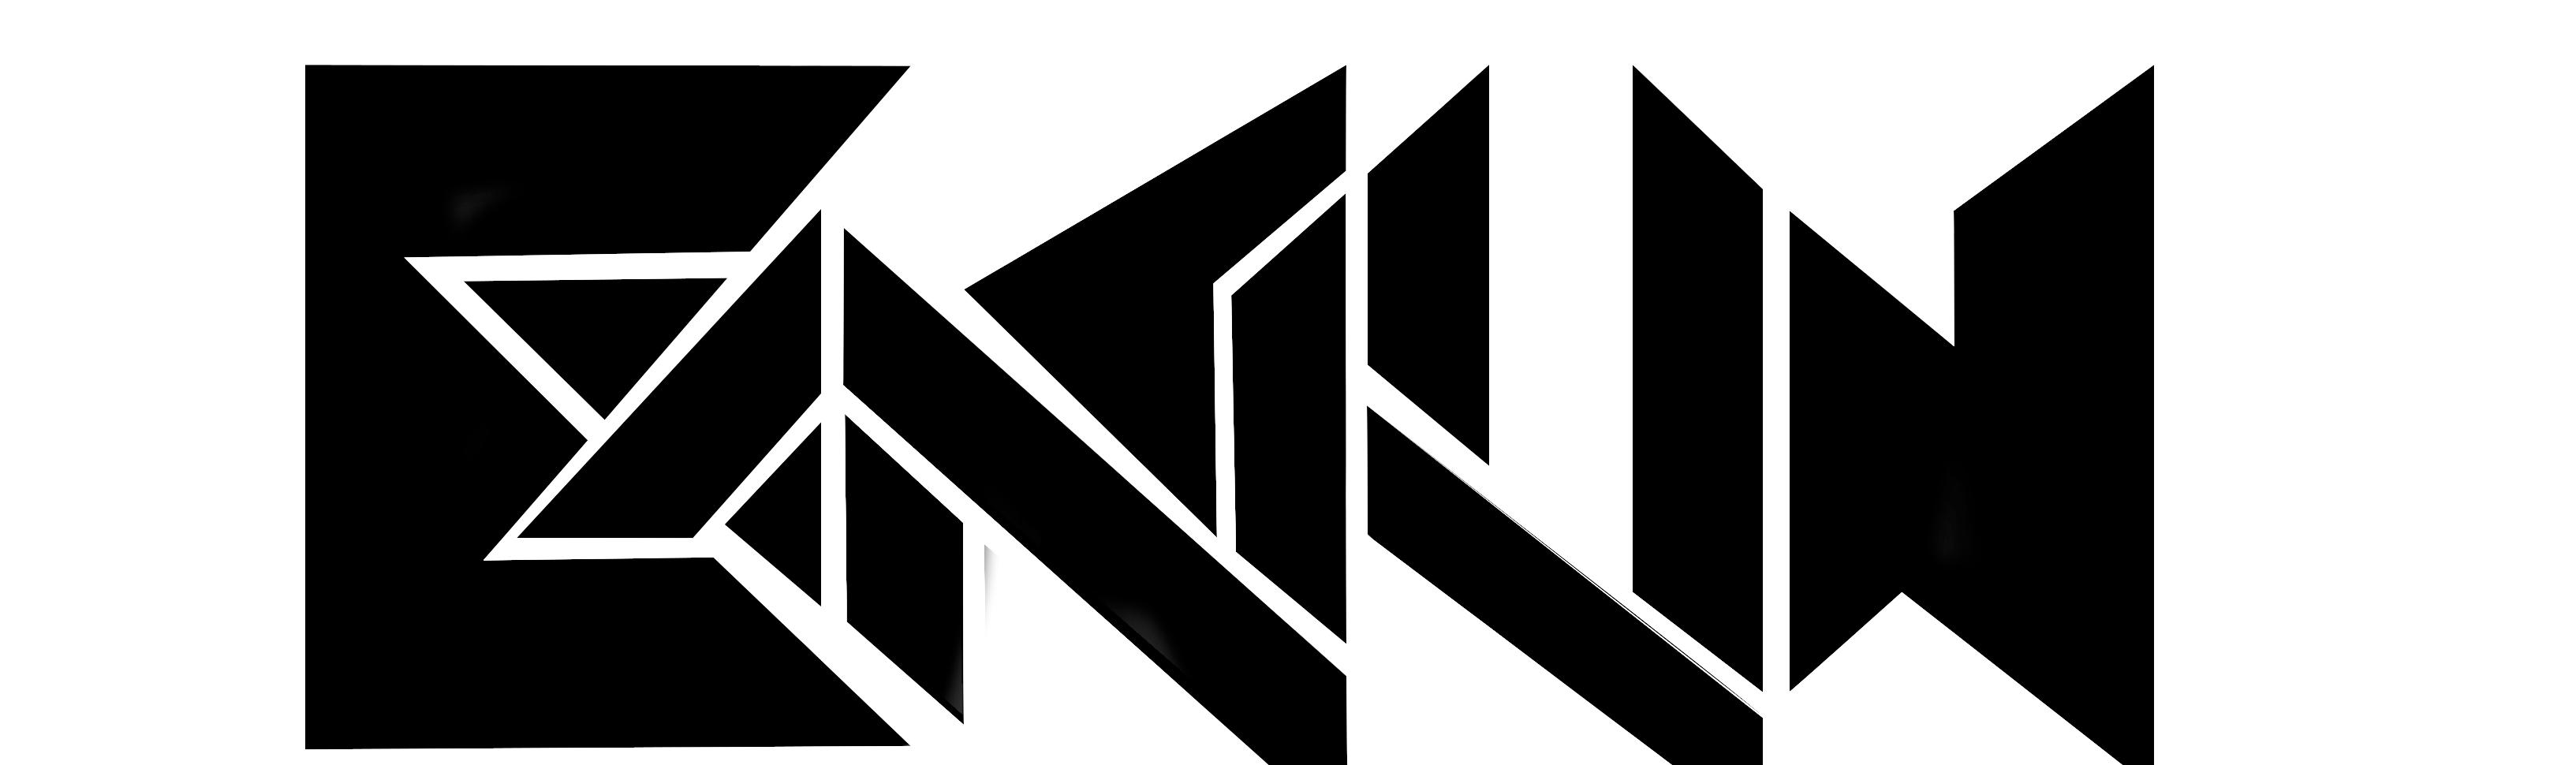 EXAGUN